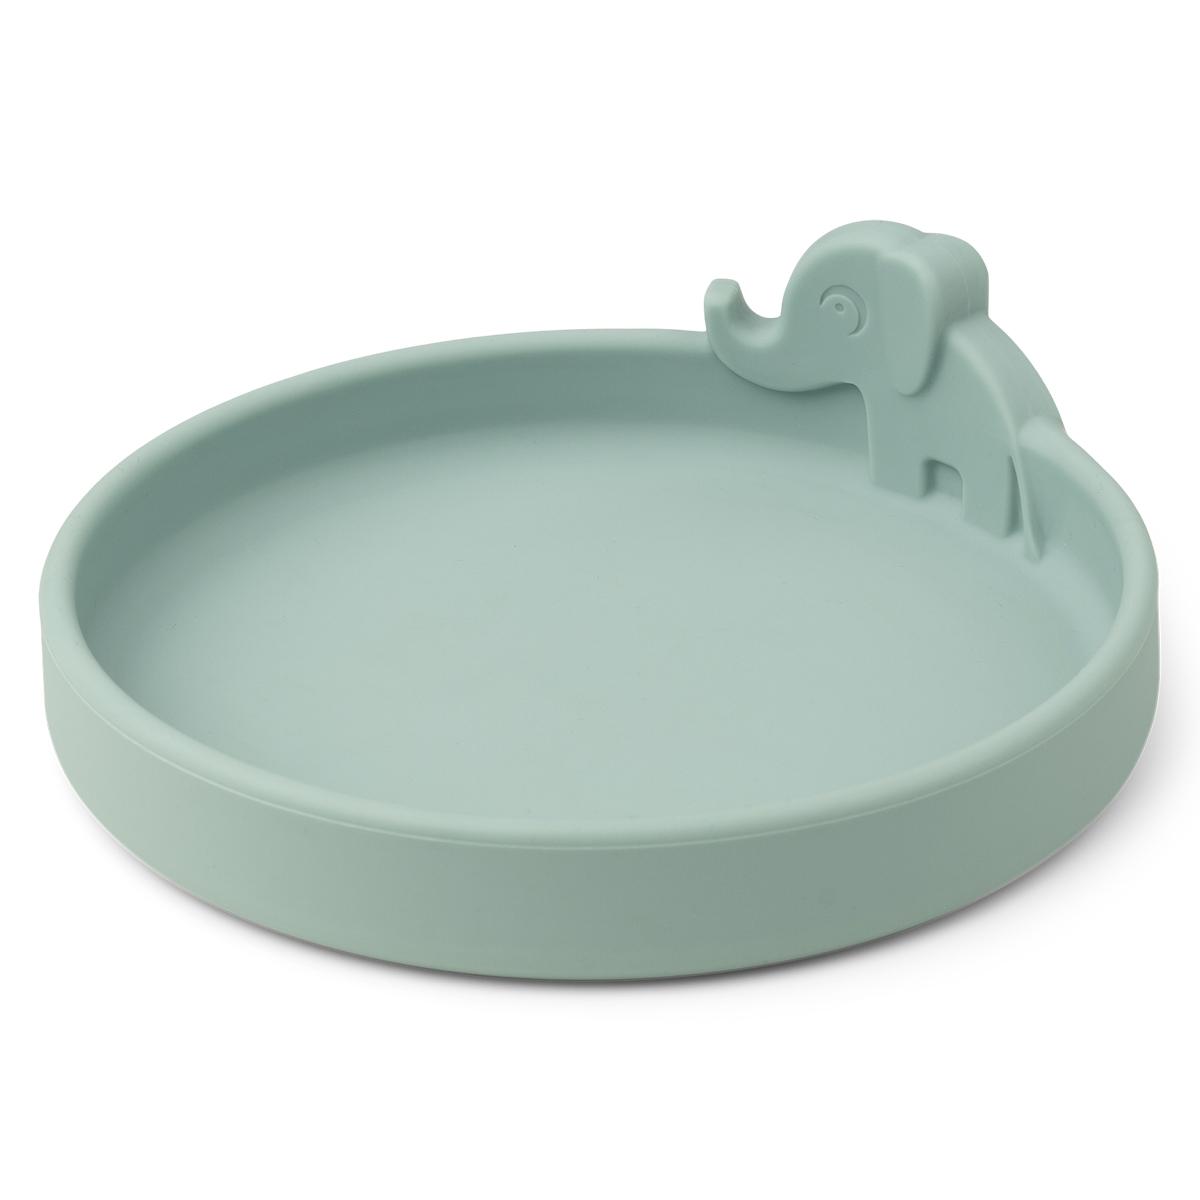 Vaisselle & Couvert Assiette Peekaboo Elphee - Bleu Assiette Peekaboo Elphee - Bleu